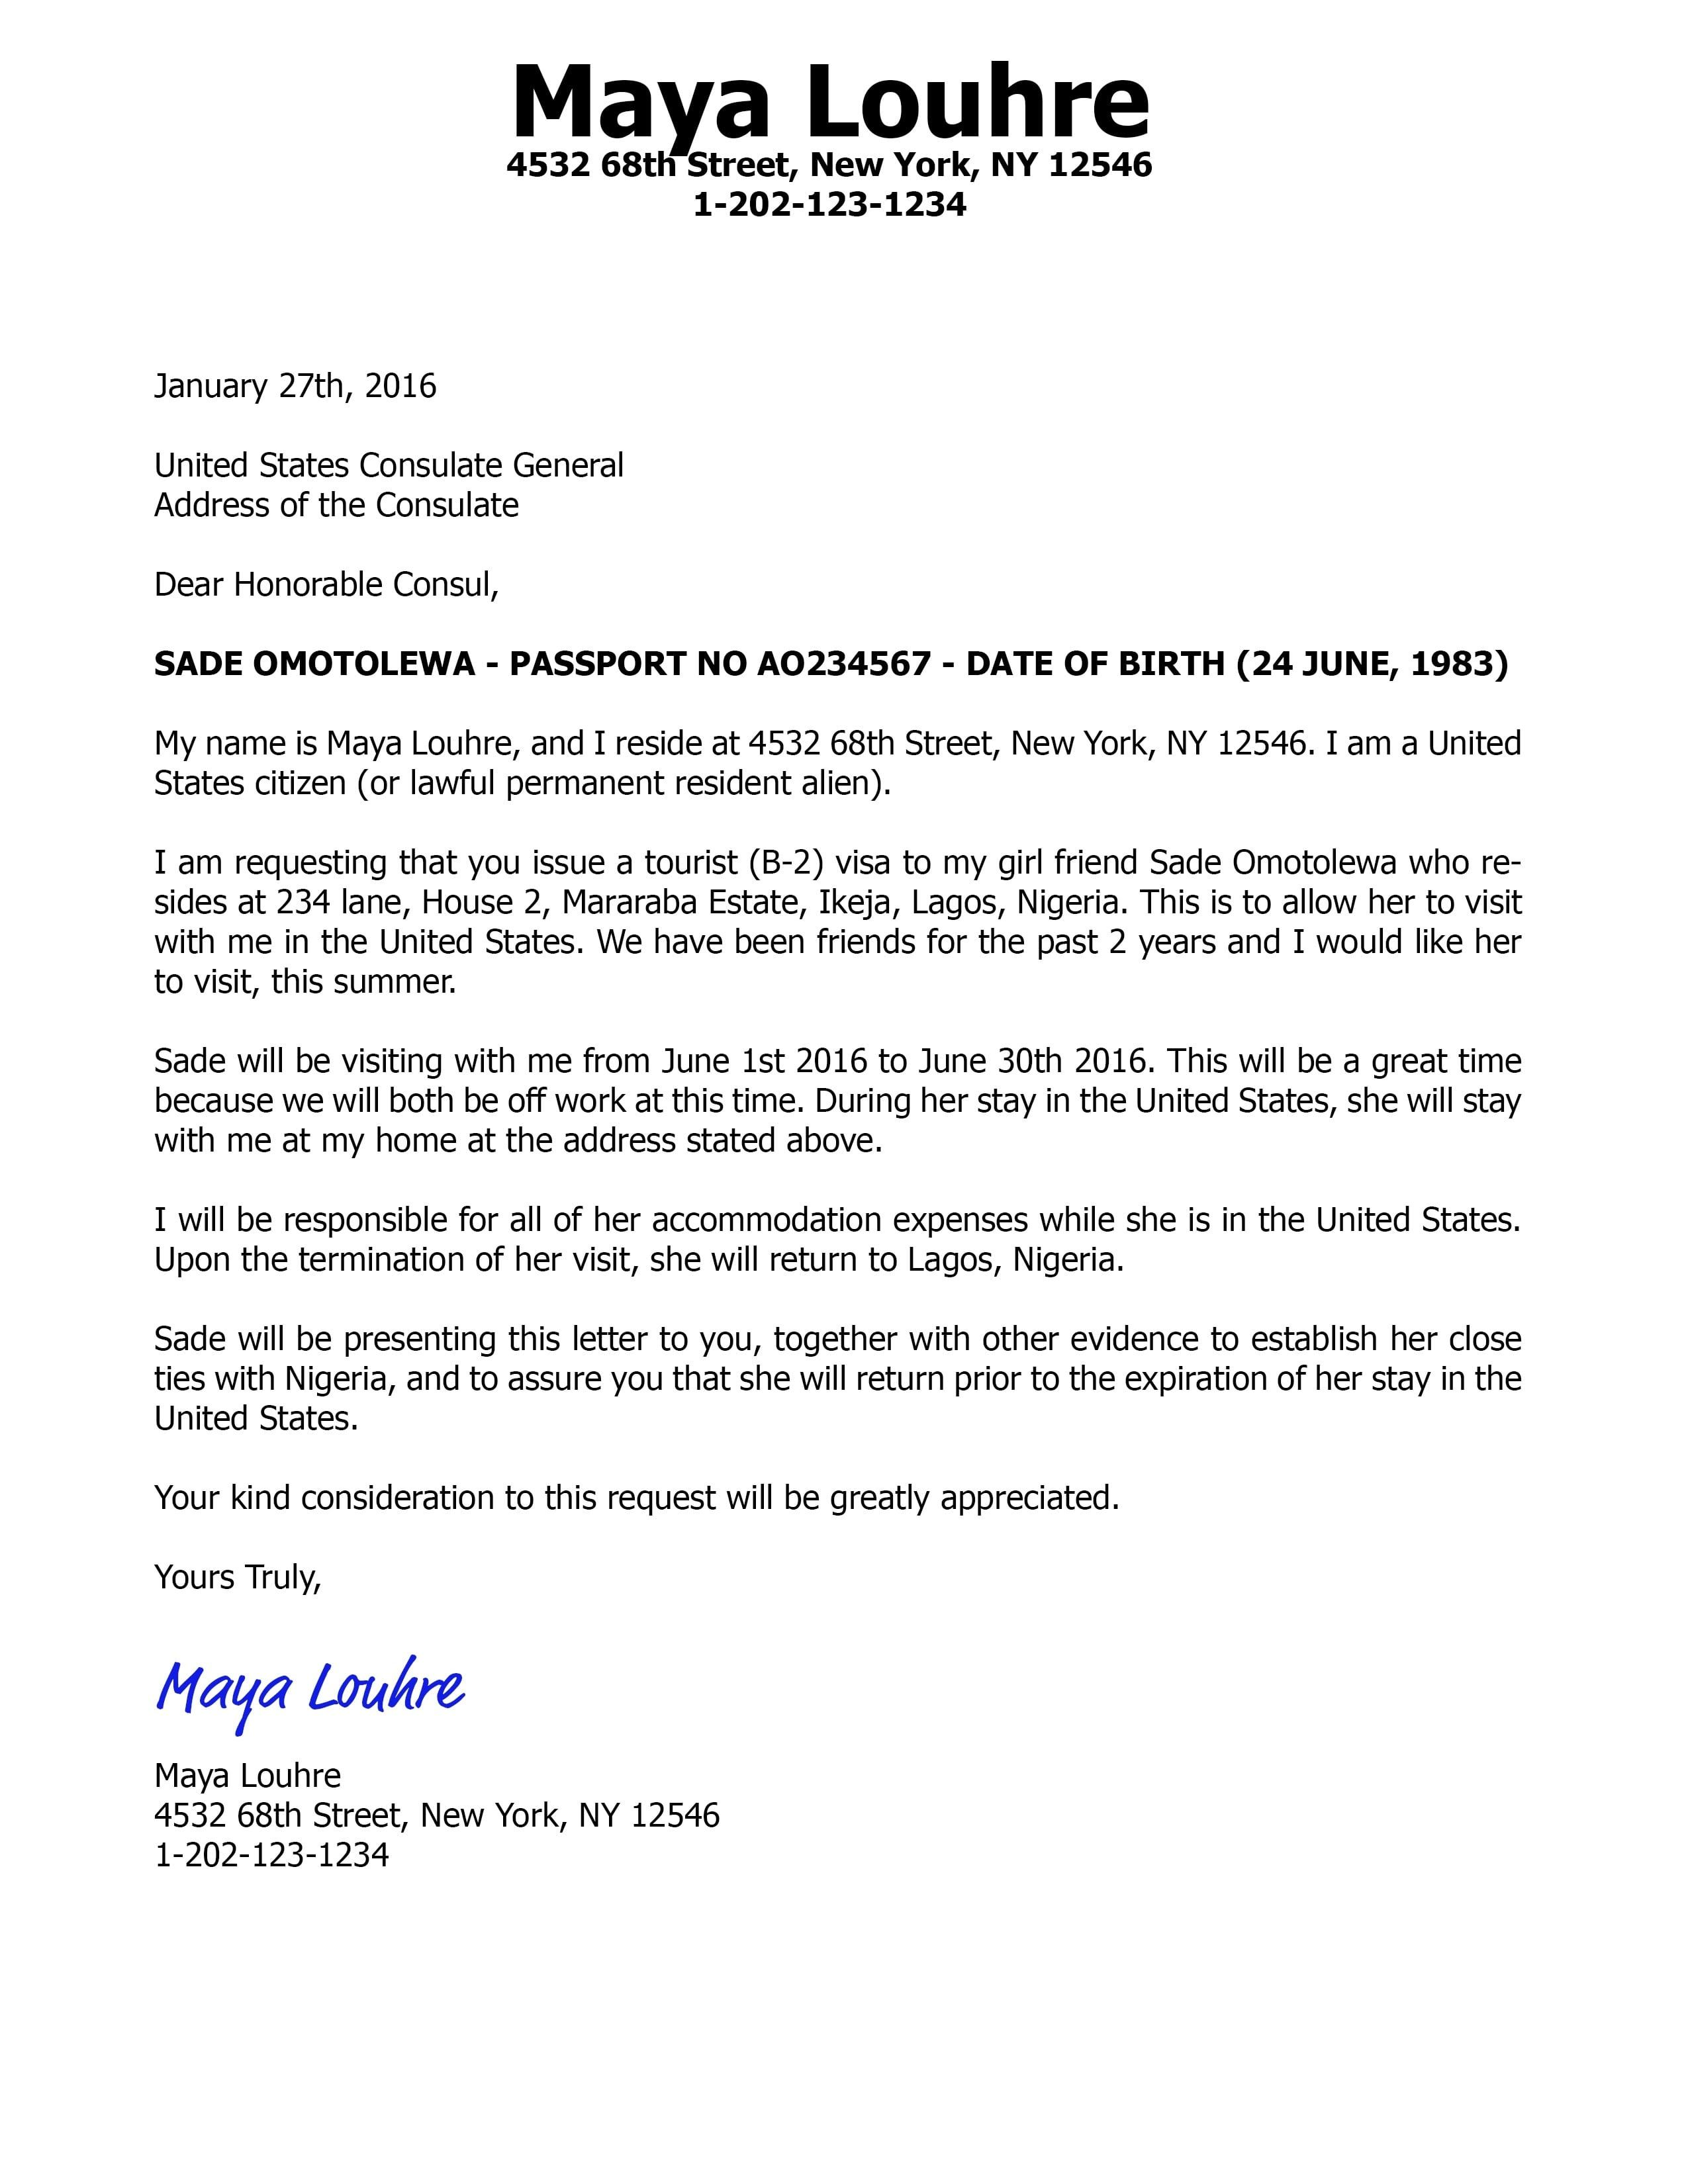 Invitations Letter For Visitor Visa Friend Sample of